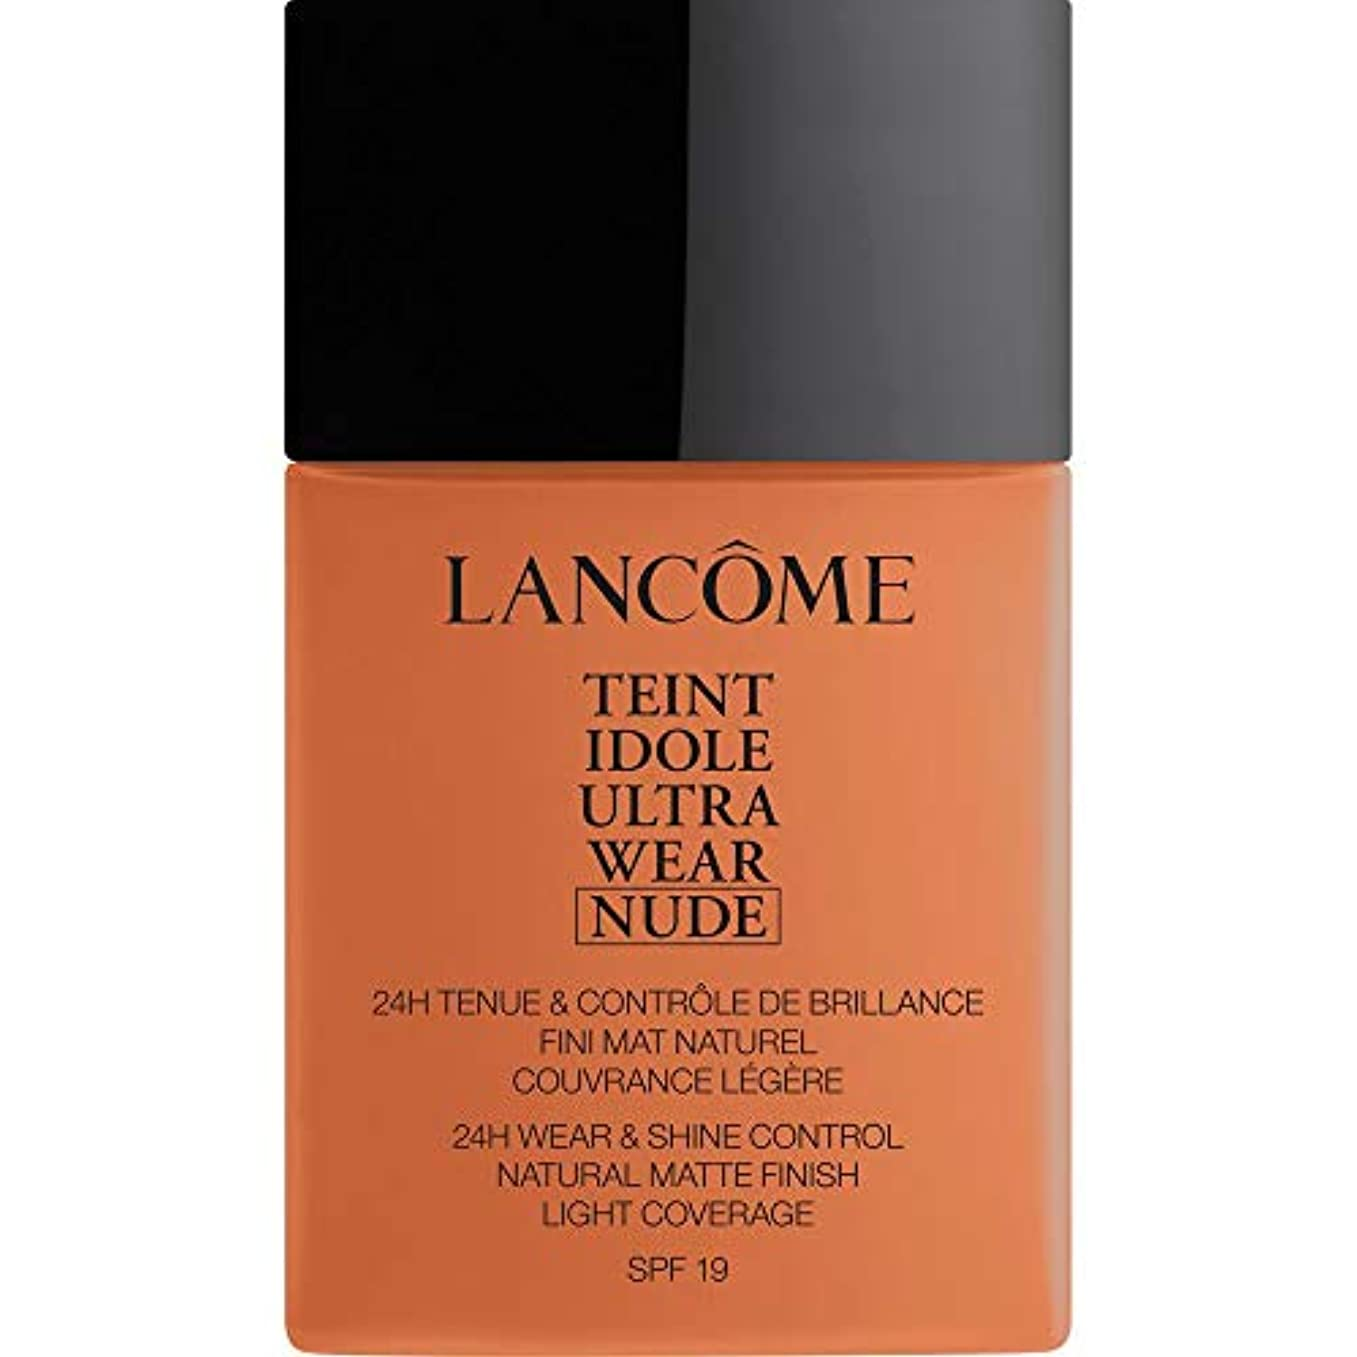 [Lanc?me ] ランコムTeintのIdole超摩耗ヌード財団Spf19の40ミリリットル10 - プラリネ - Lancome Teint Idole Ultra Wear Nude Foundation SPF19...